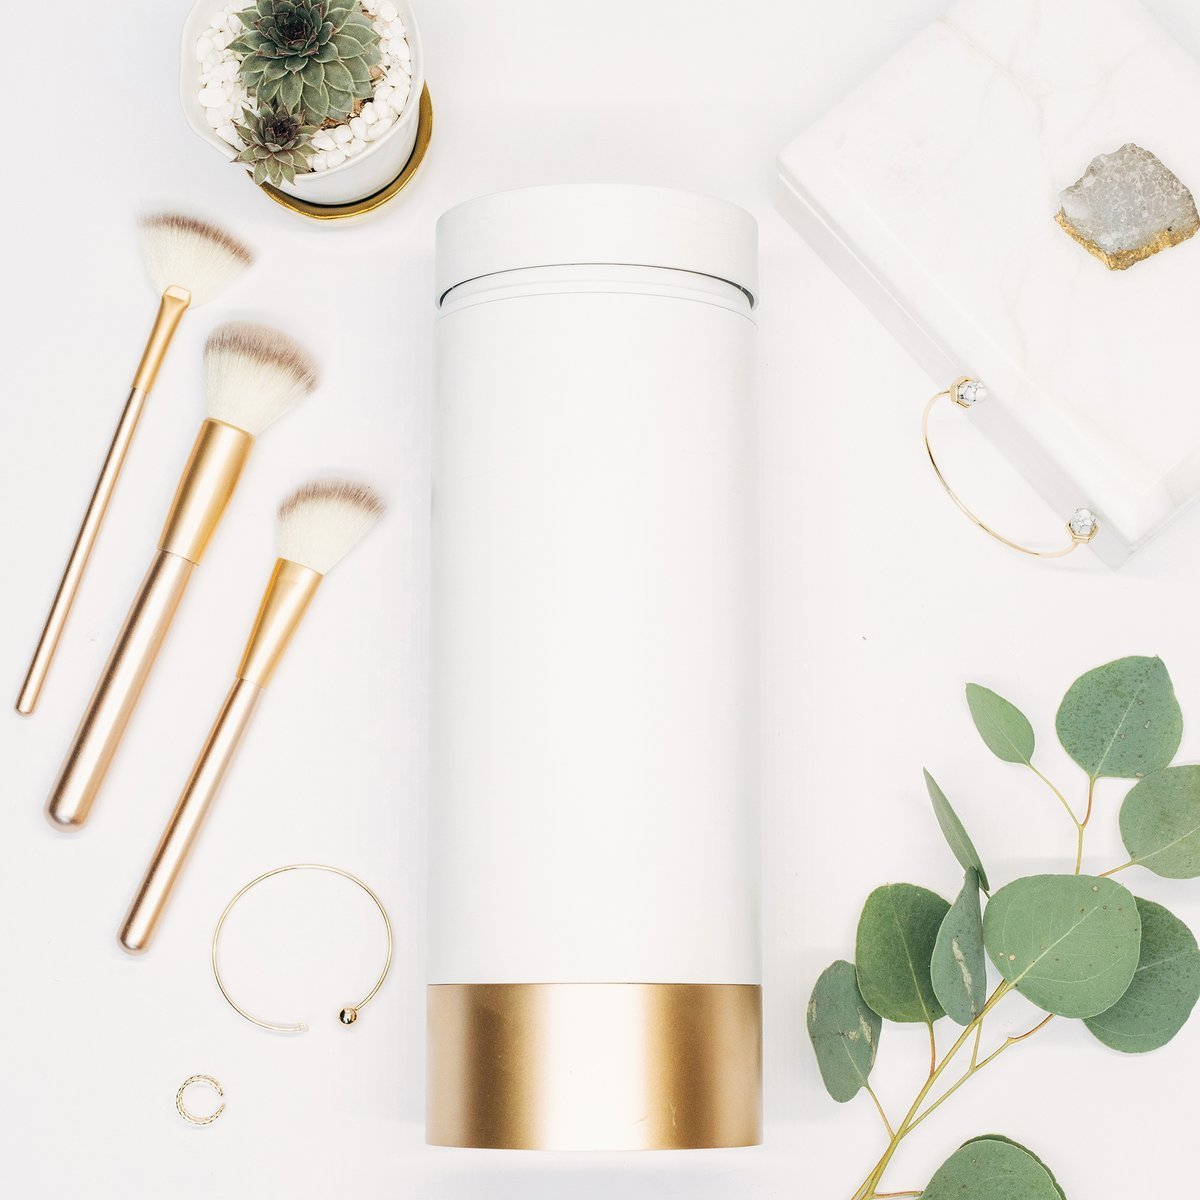 化妝掃消毒機 | Brushean